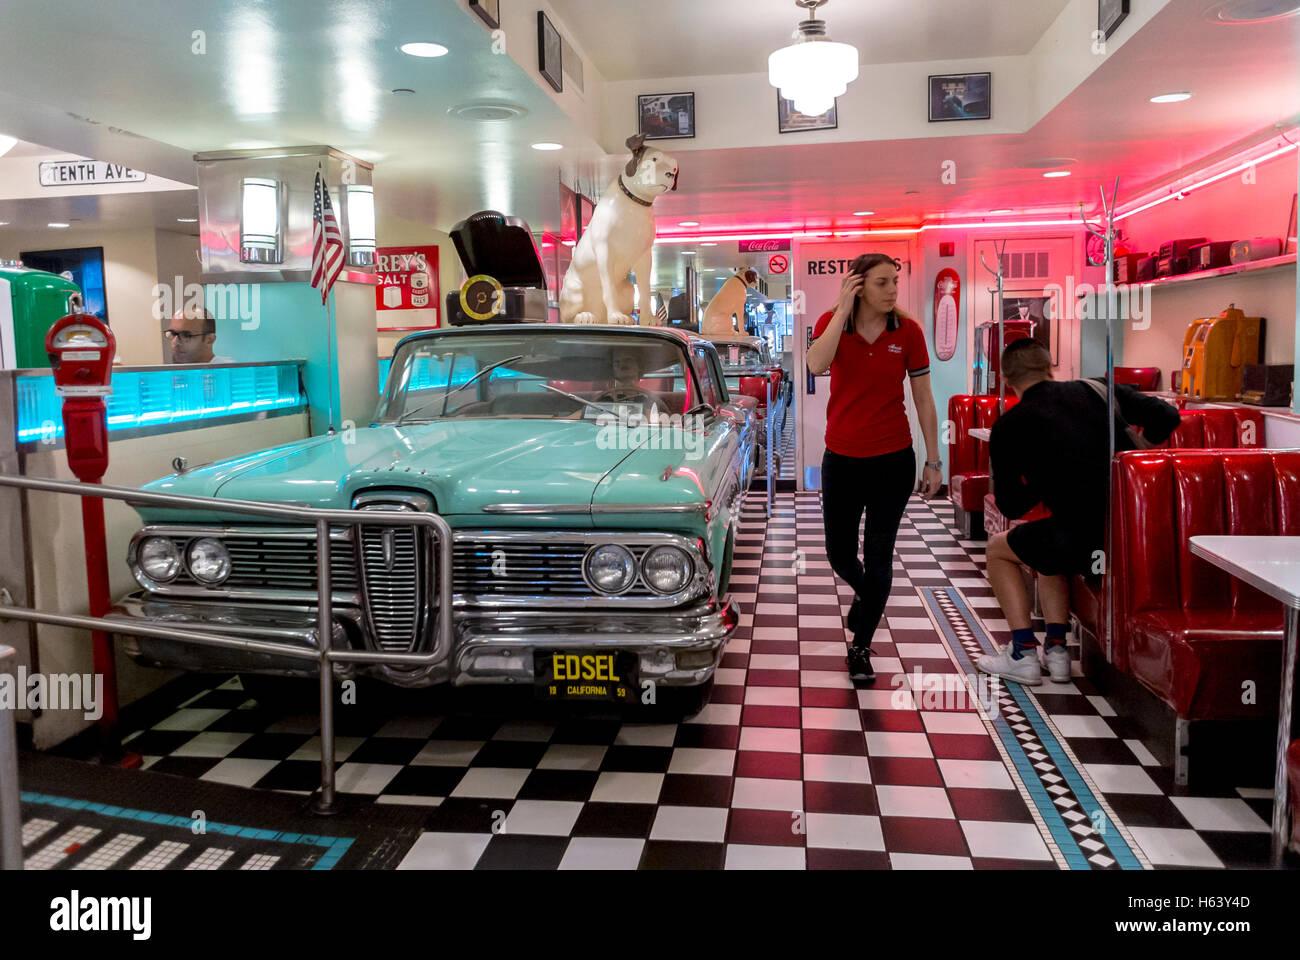 San francisco ca usa waitress walking inside lori 39 s for American cuisine in san francisco